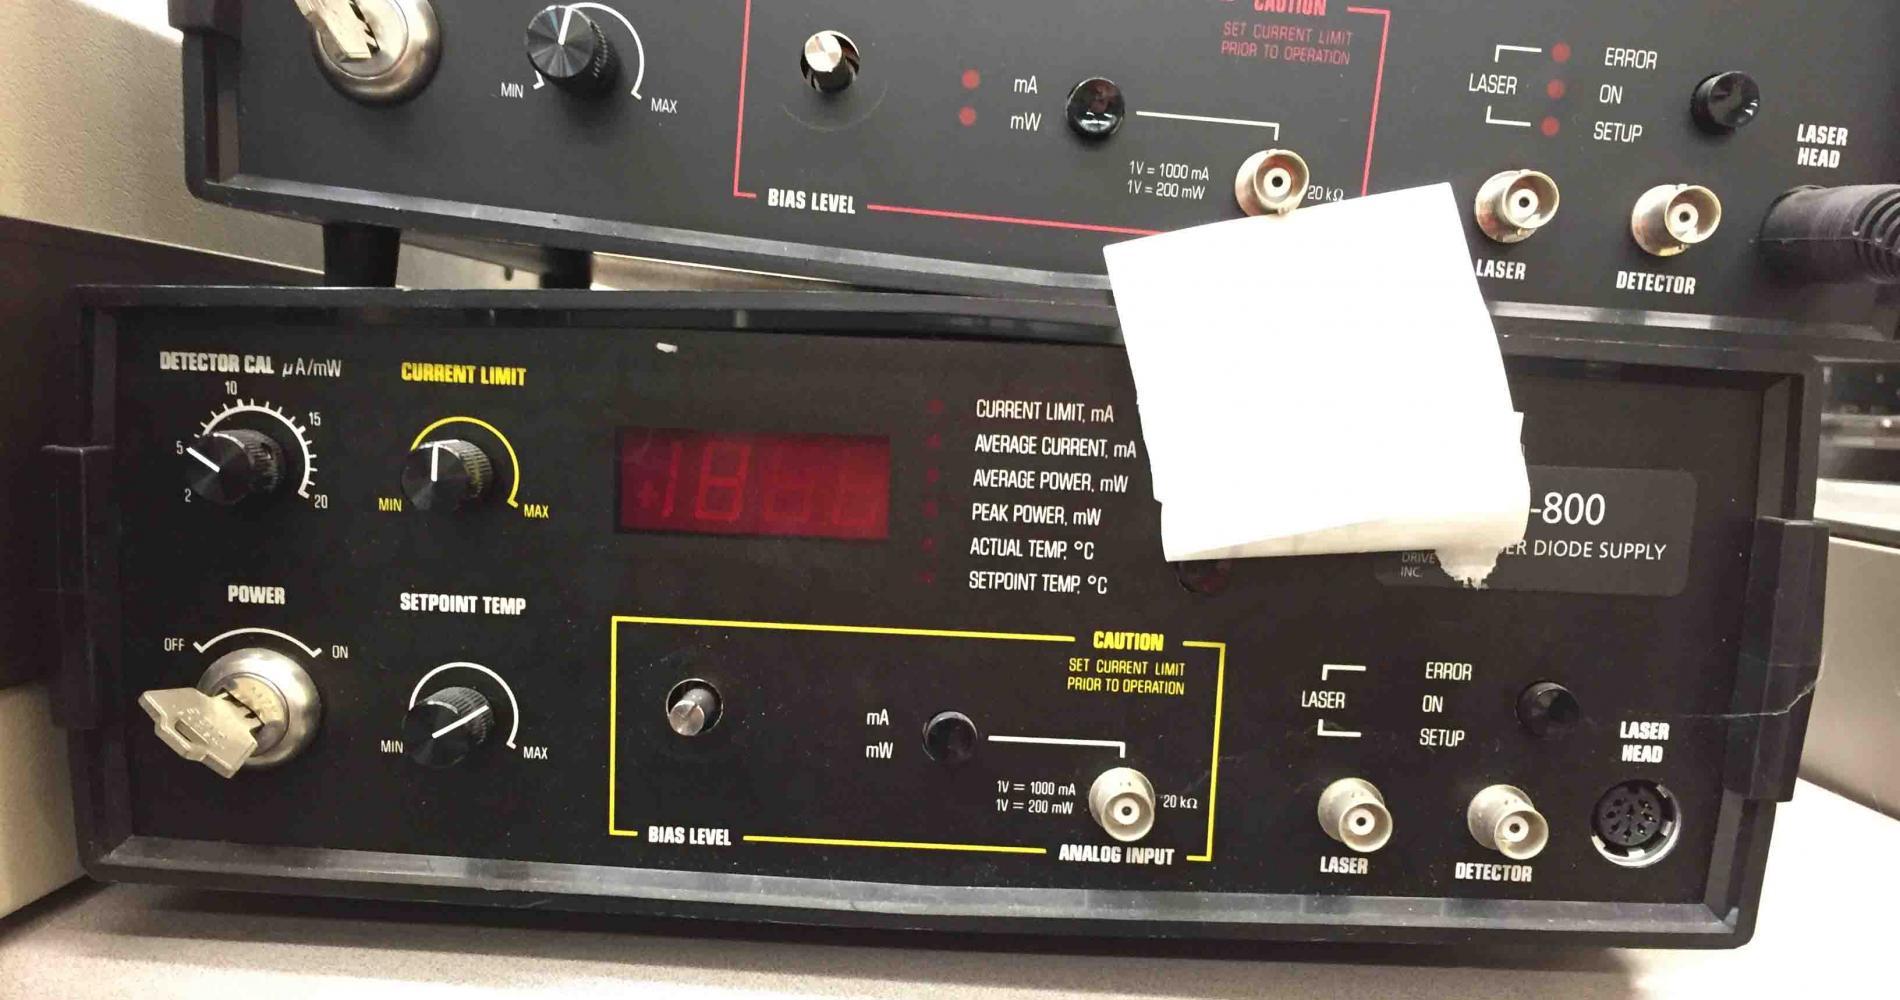 LASER DRIVE INC / LDI LDI-800 used for sale price #9172989